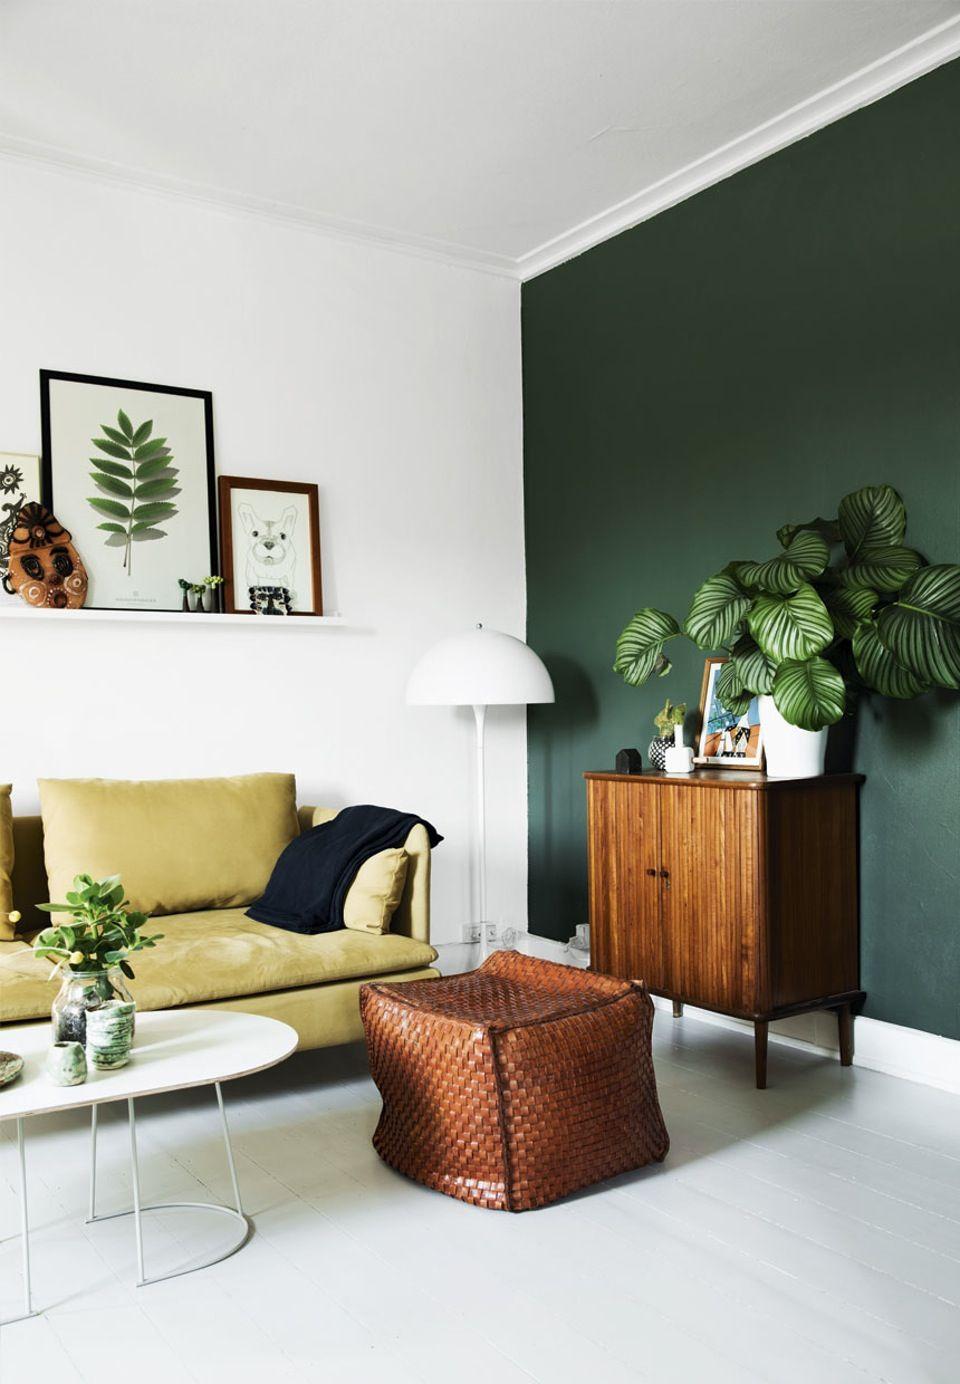 le fil vert en decoration d interieur un mur vert emeraude